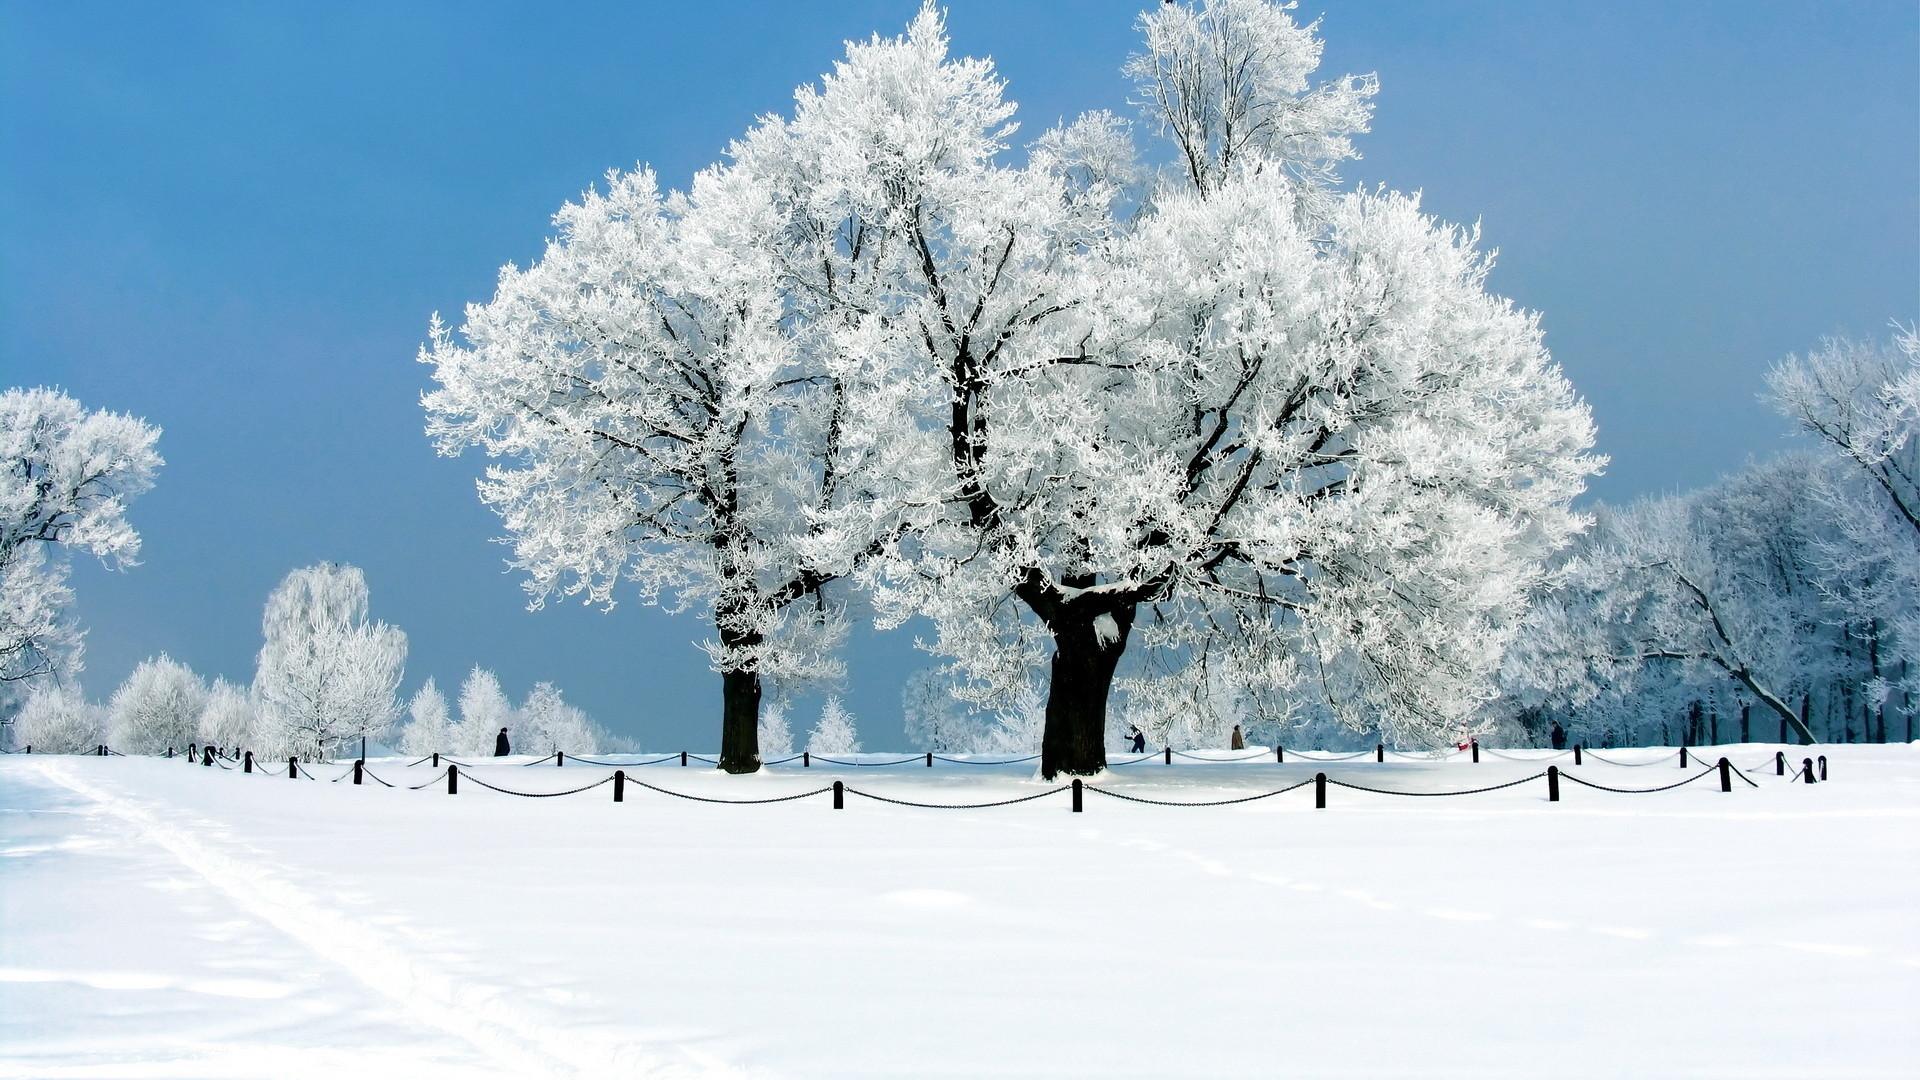 Beautiful Winter Wallpapers HD   1920 x 1080p Download Premium Quality #HD # winter #